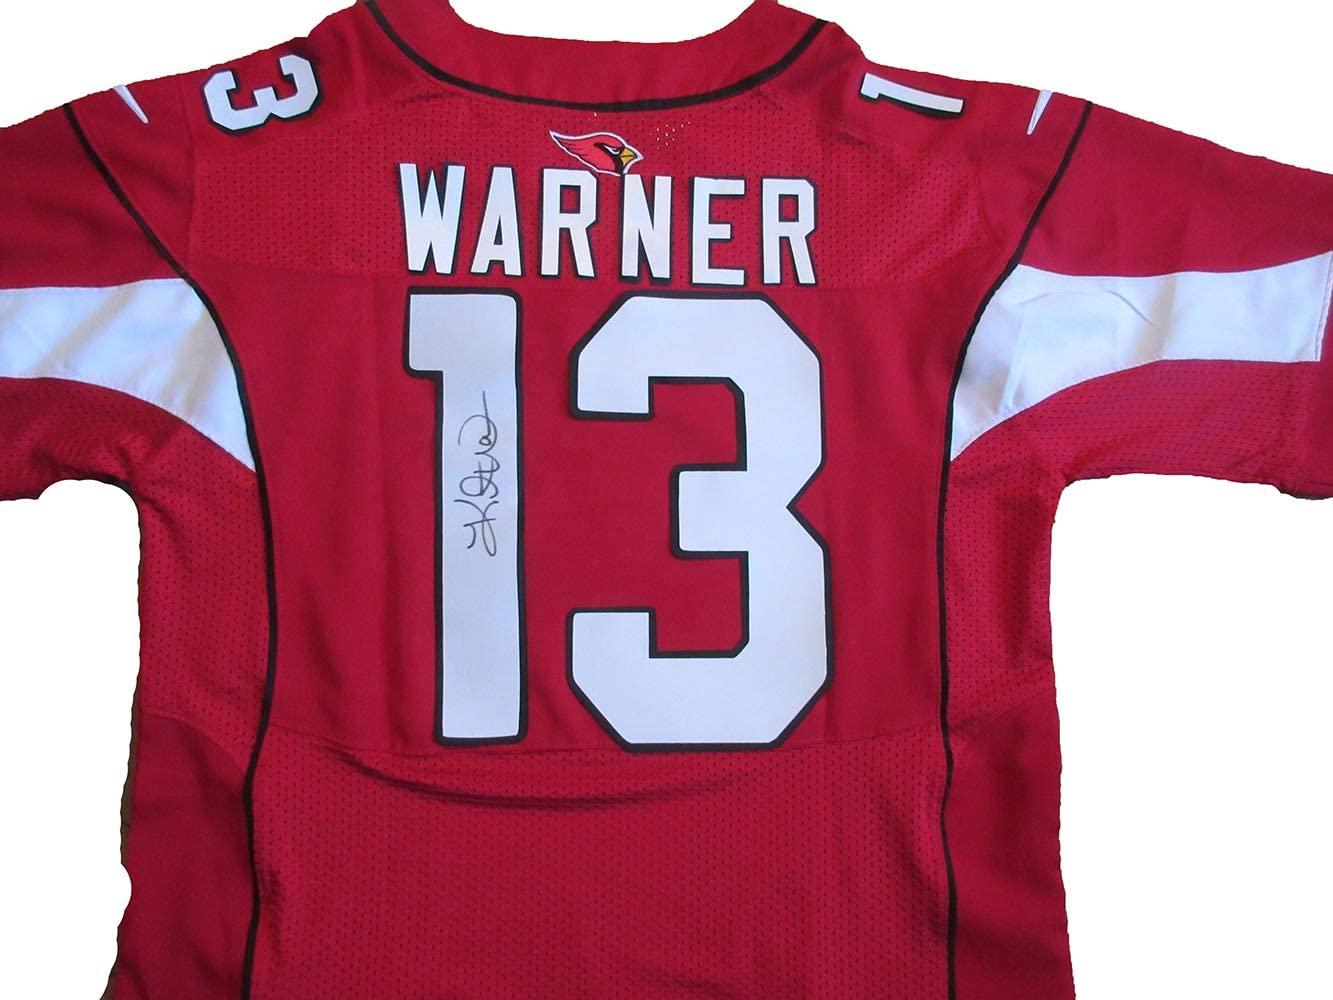 Kurt Warner Autographed Arizona Cardinals Jersey W/PROOF Picture of Kurt Signing For Us, St. Louis Rams, Arizona Cardinals, Super Bowl Champion, New York Giants, Green Bay Packers, MVP